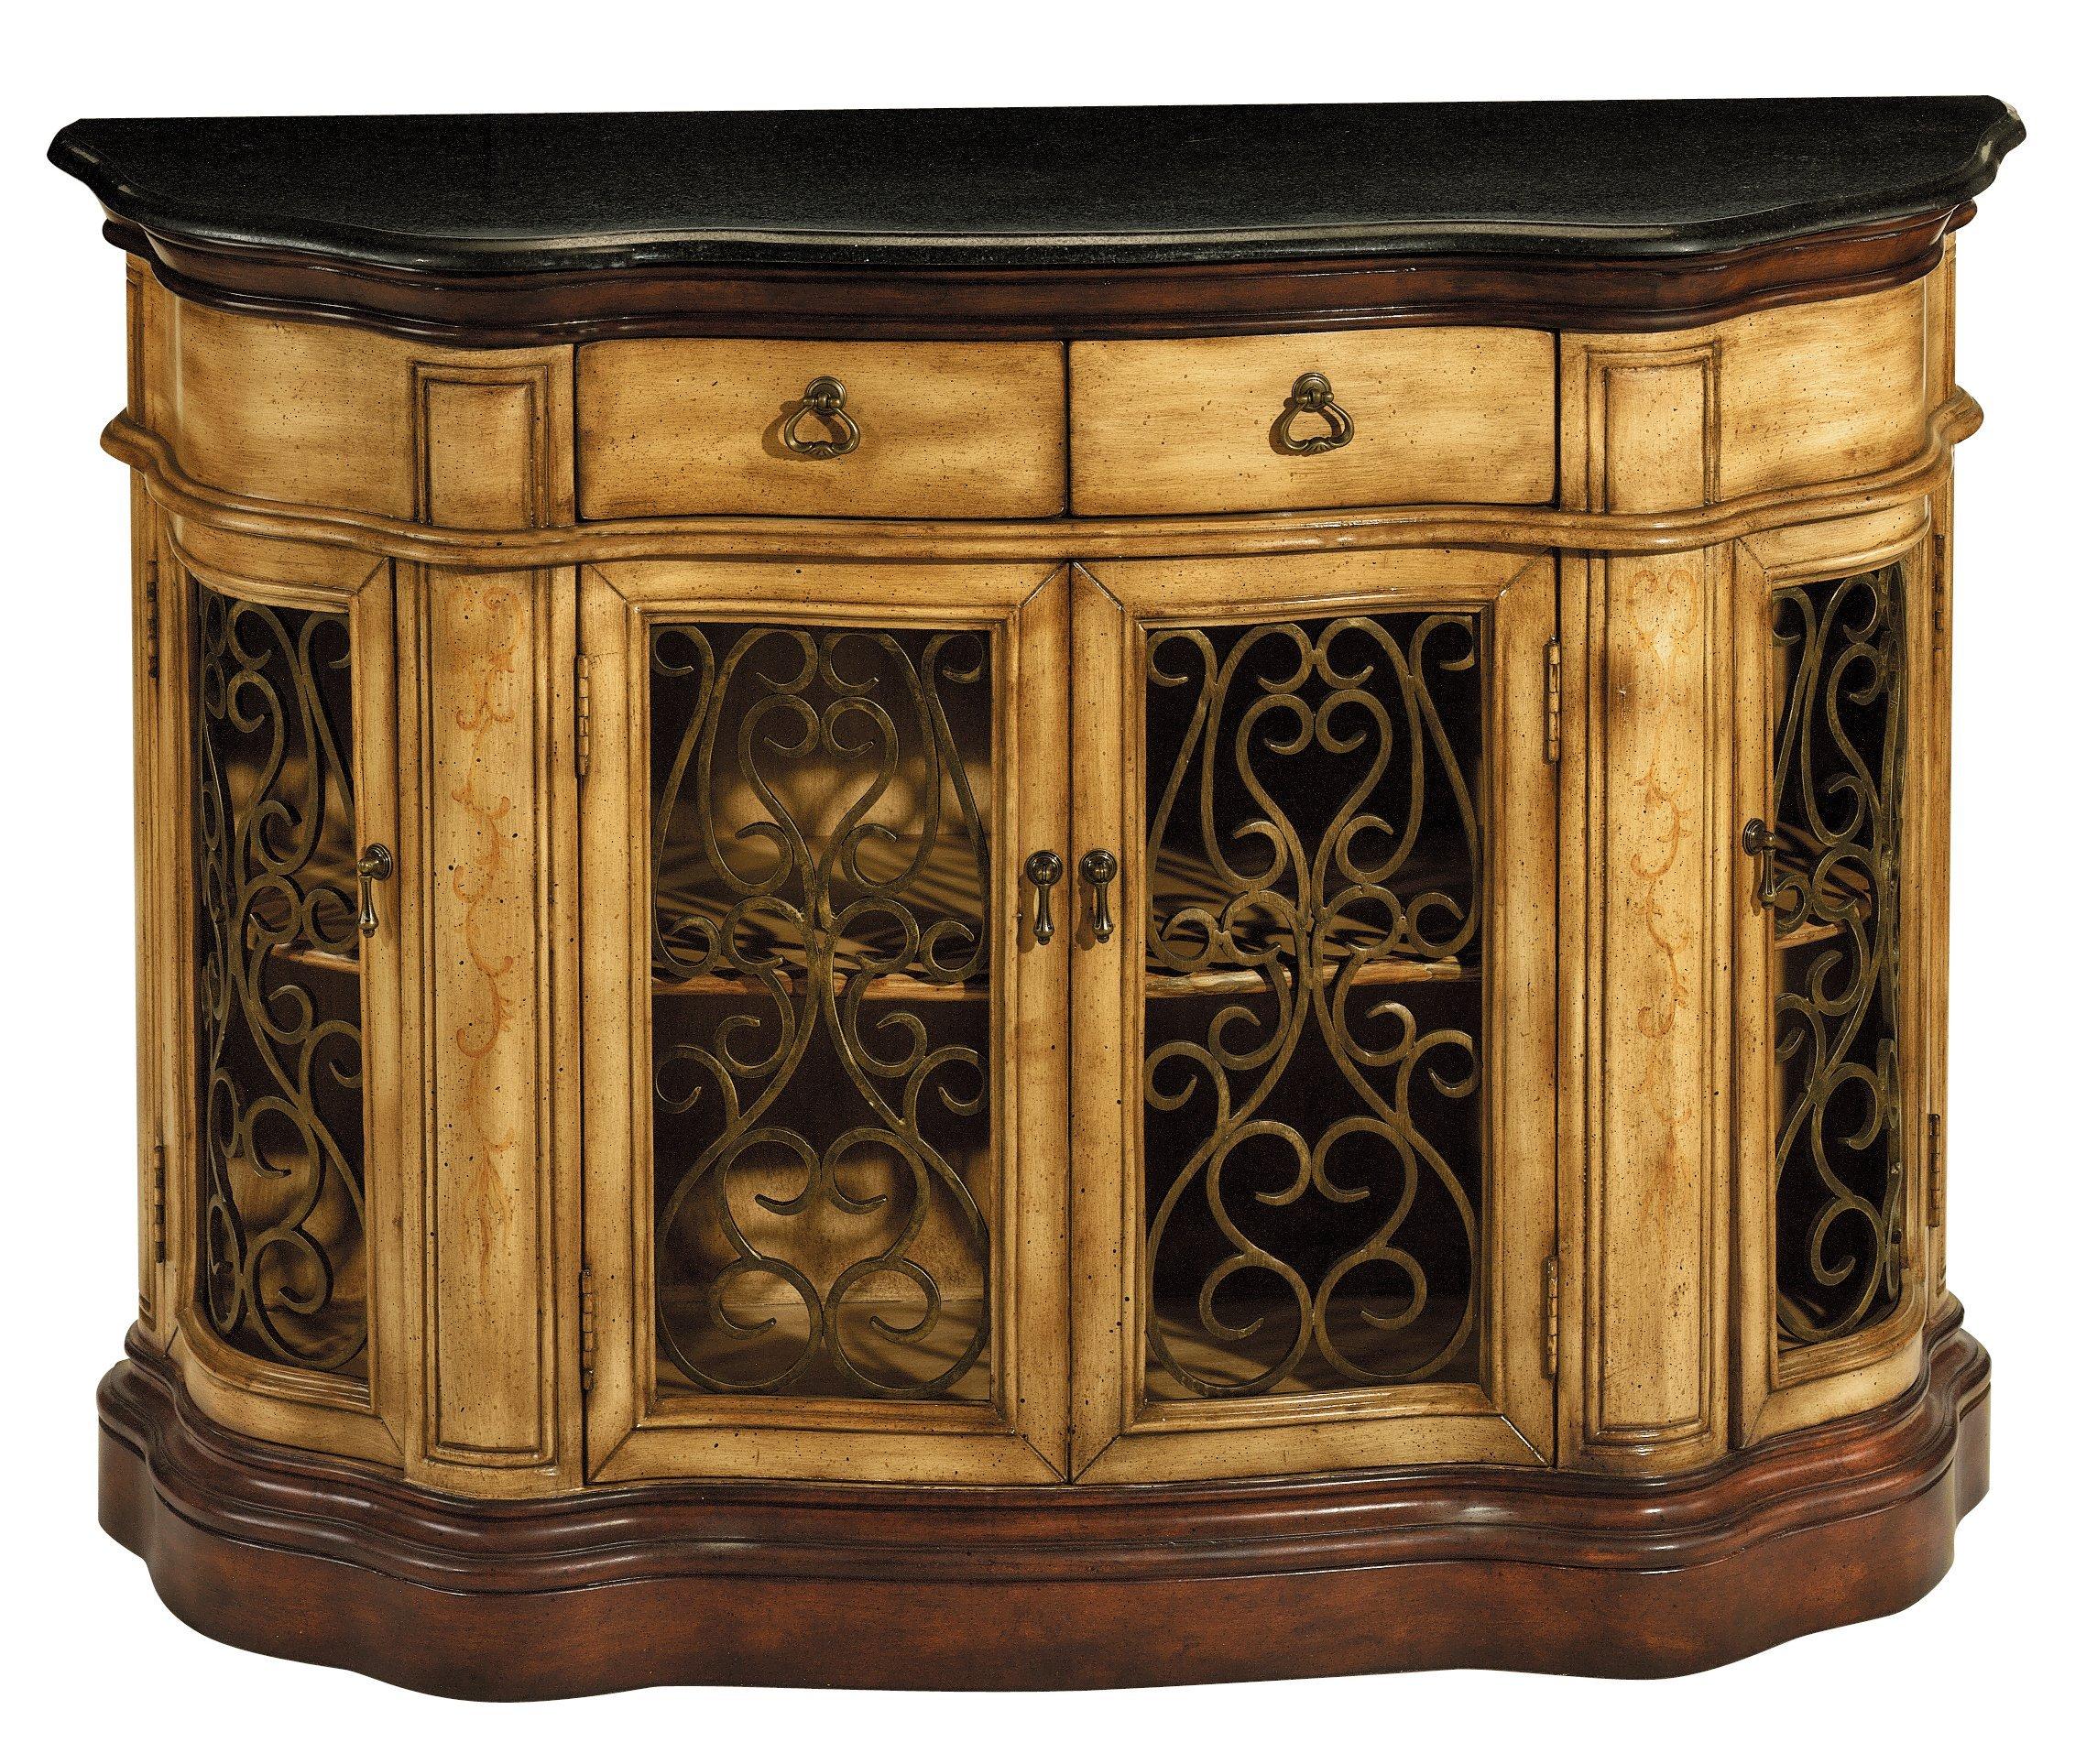 Stein World Furniture Canterbury Granite Top Credenza by Stein World Furniture (Image #1)